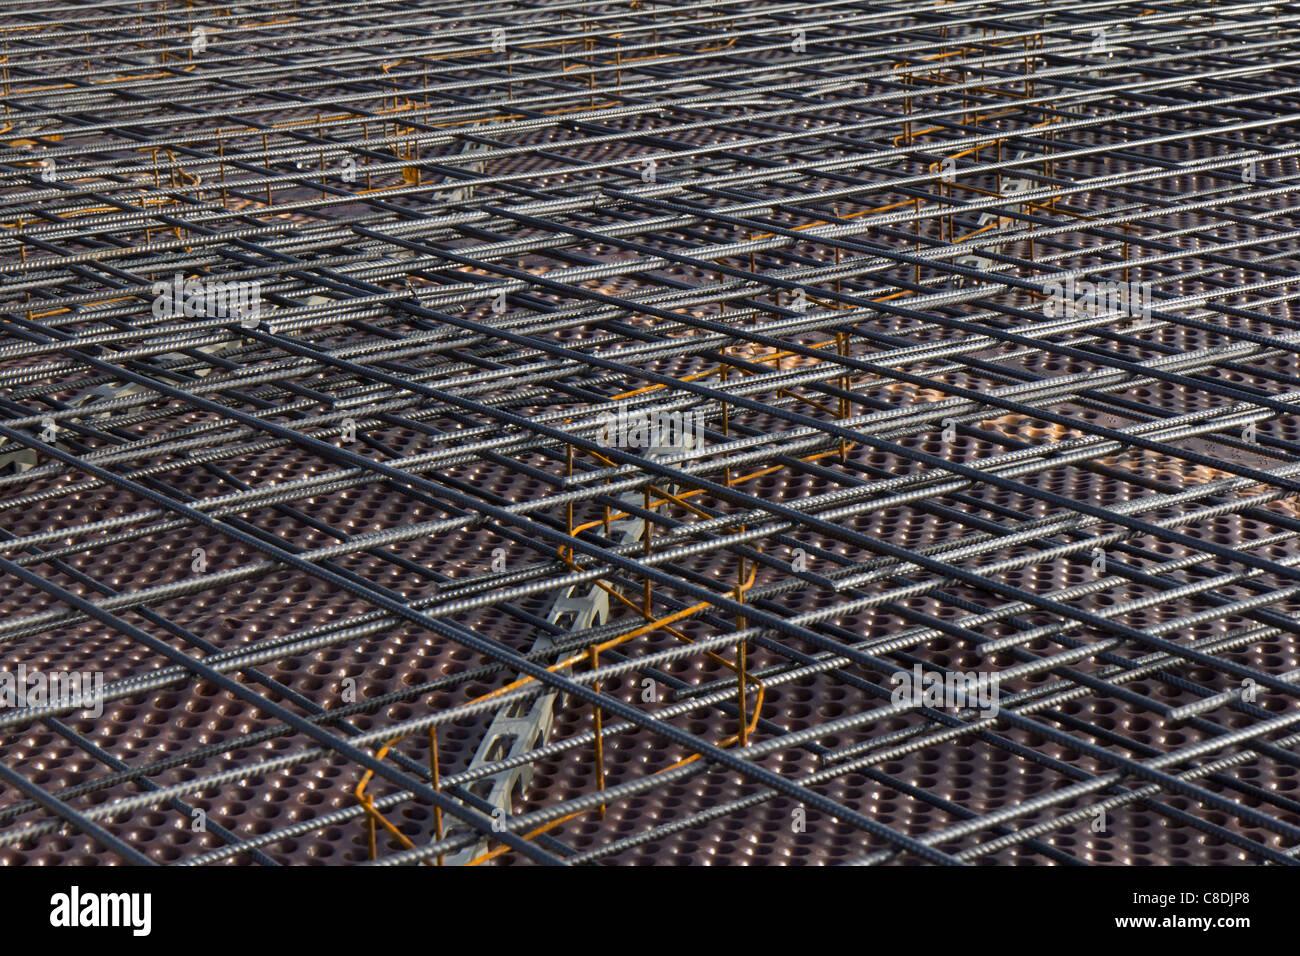 Steel Concrete Slab : Reinforcement steel mats for concrete slab foundation